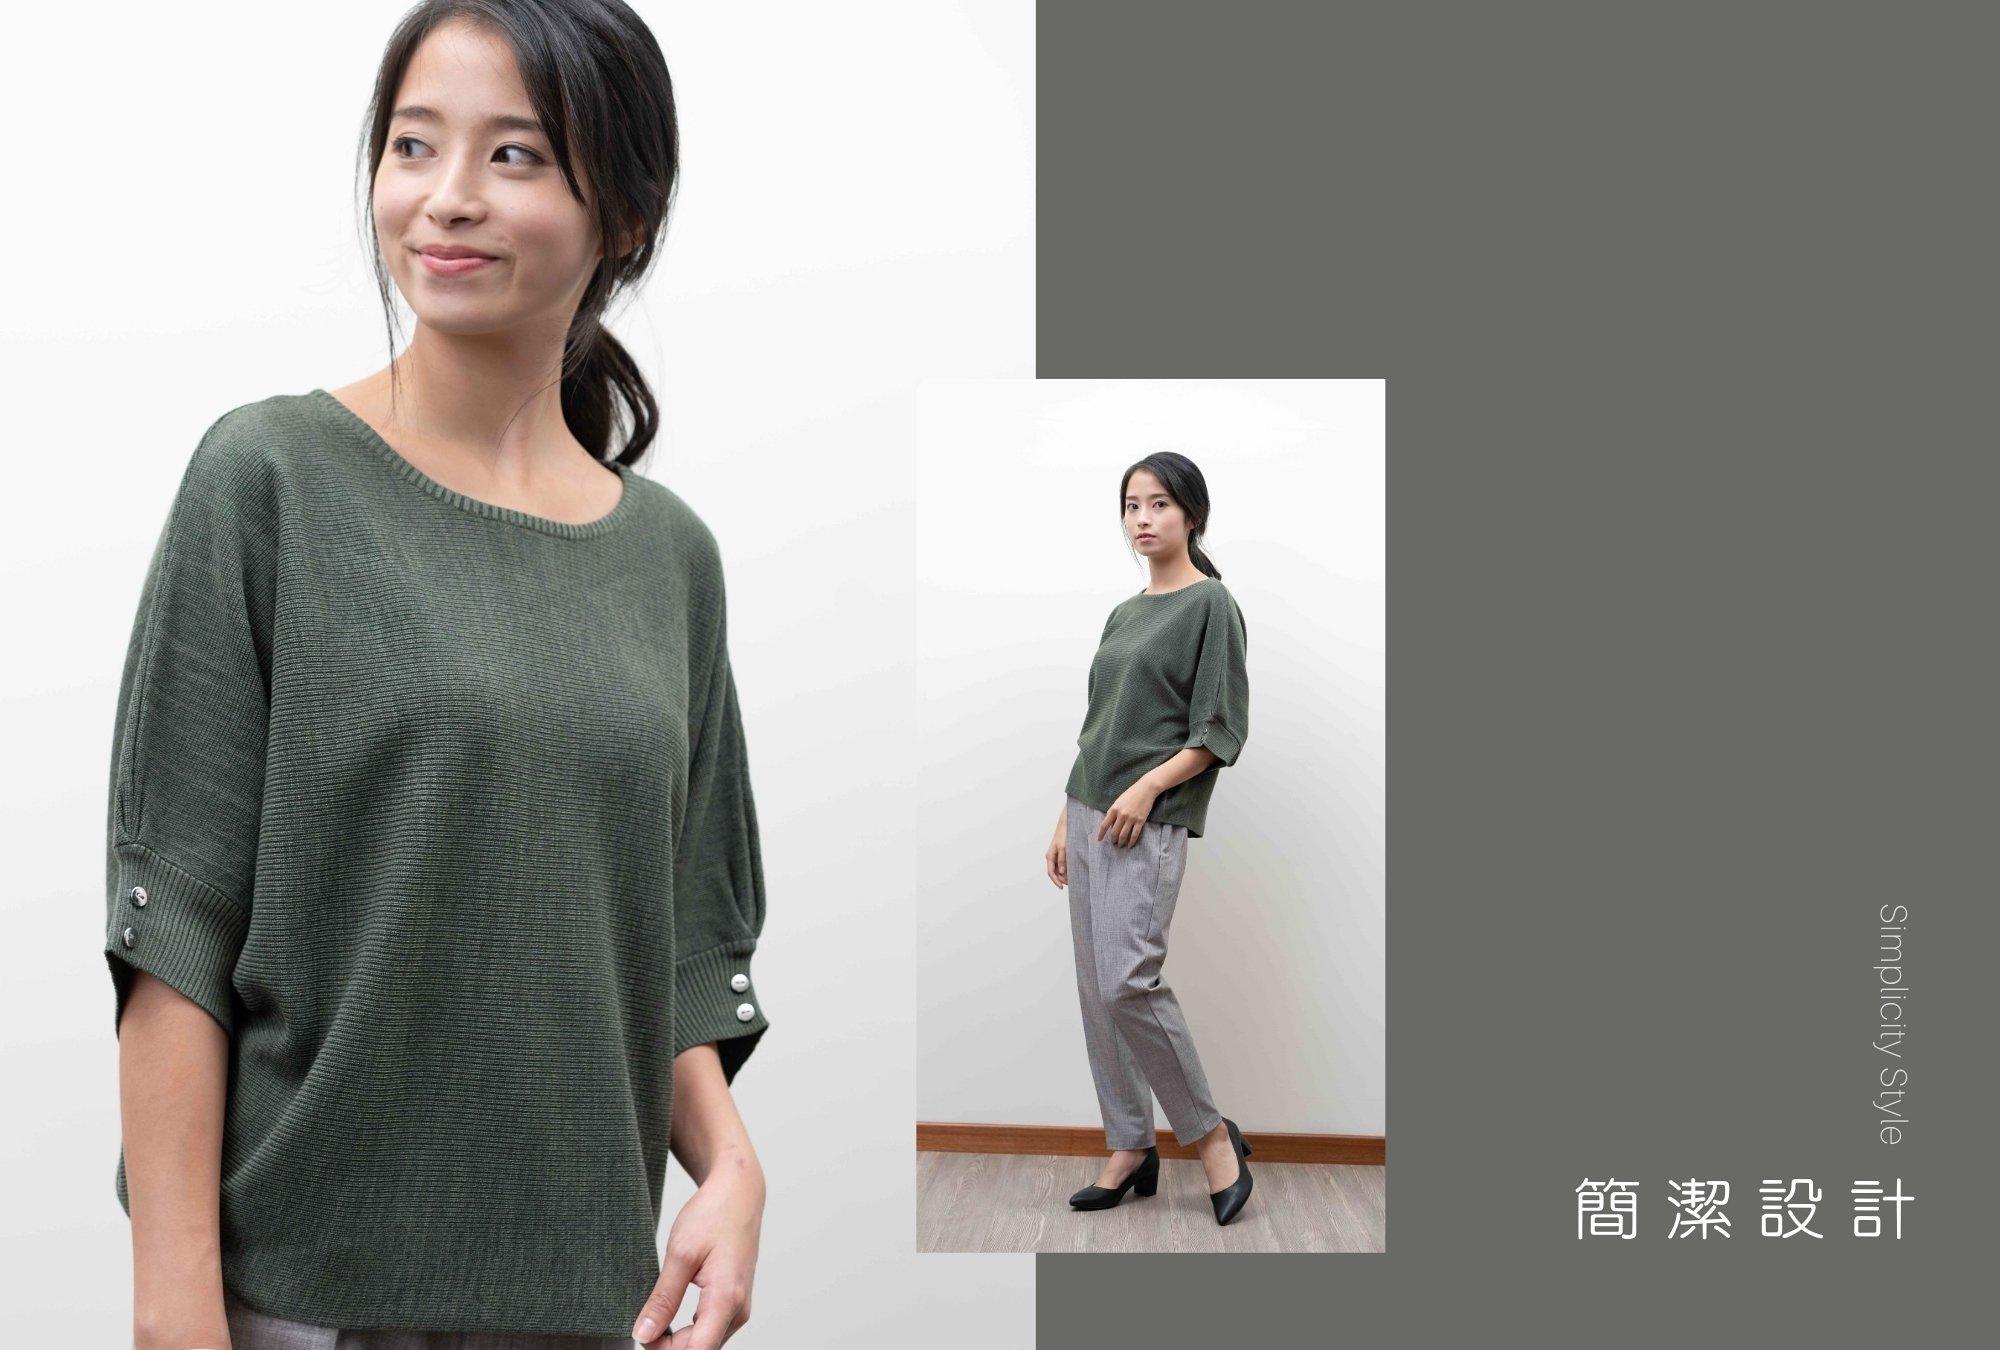 MIT針織衫視覺顯瘦